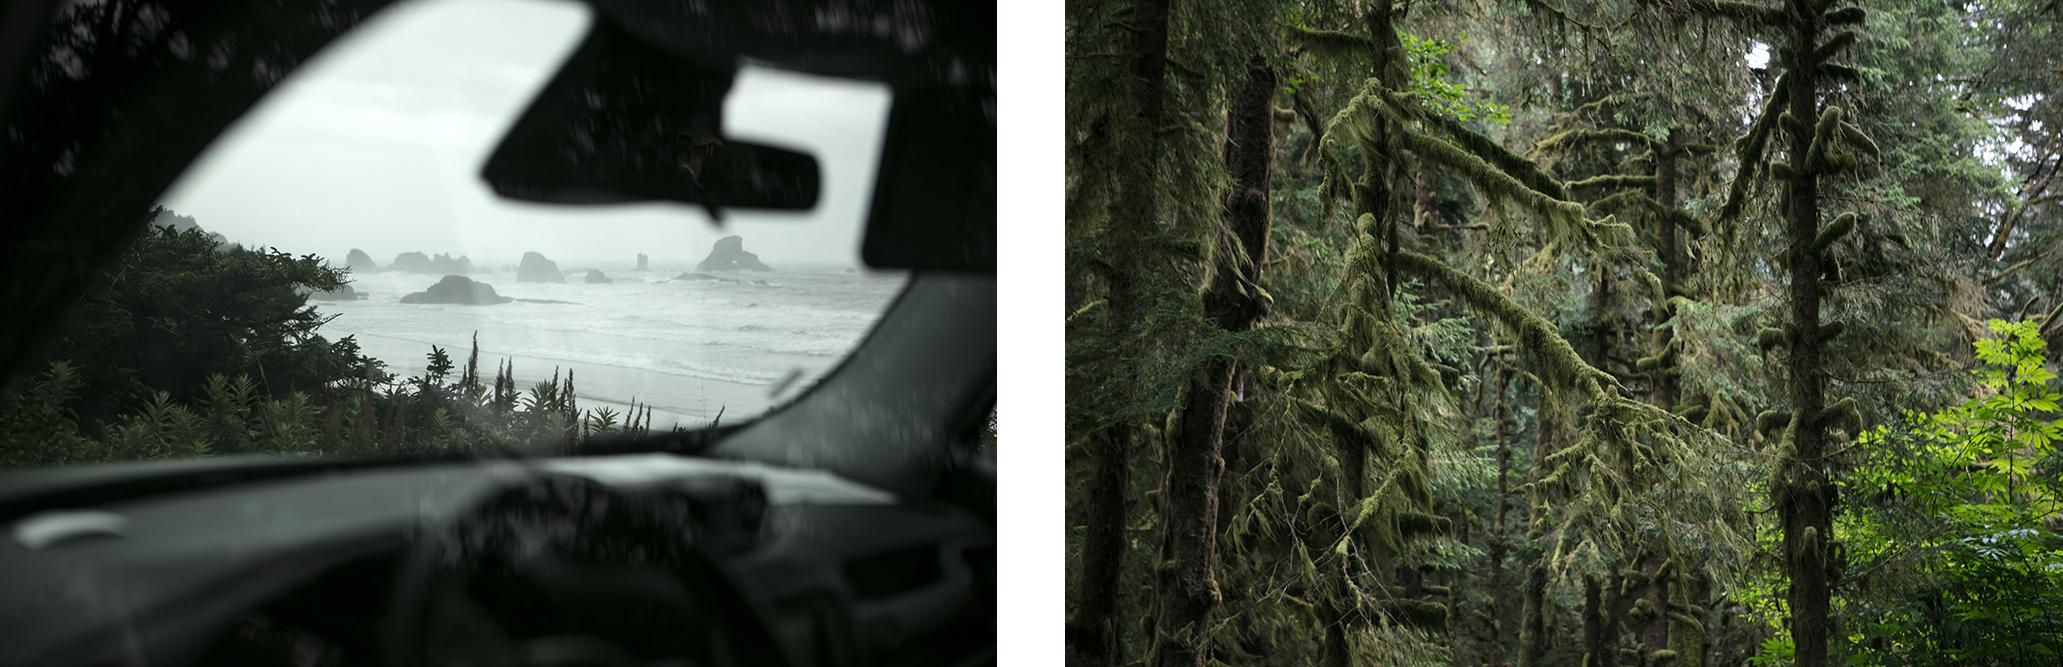 road-trip côte oregon